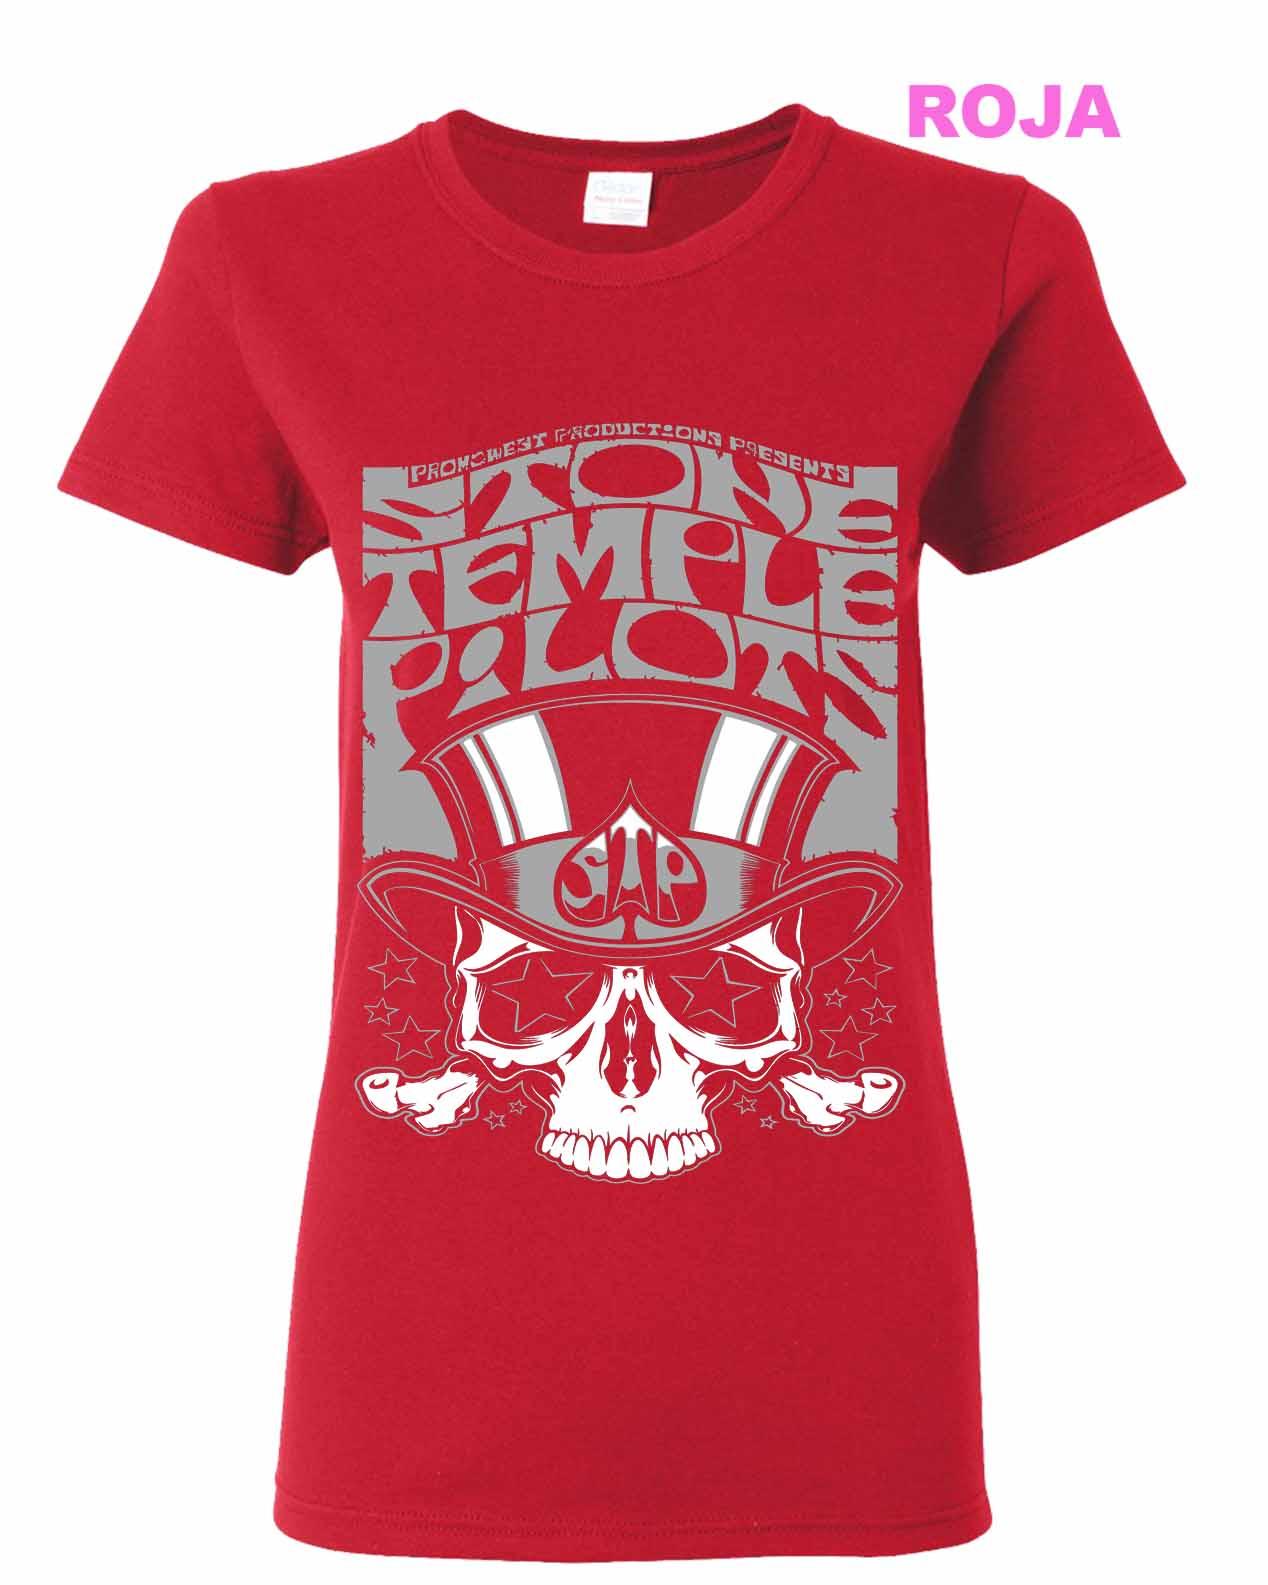 Stone Temple Pilots - Skull